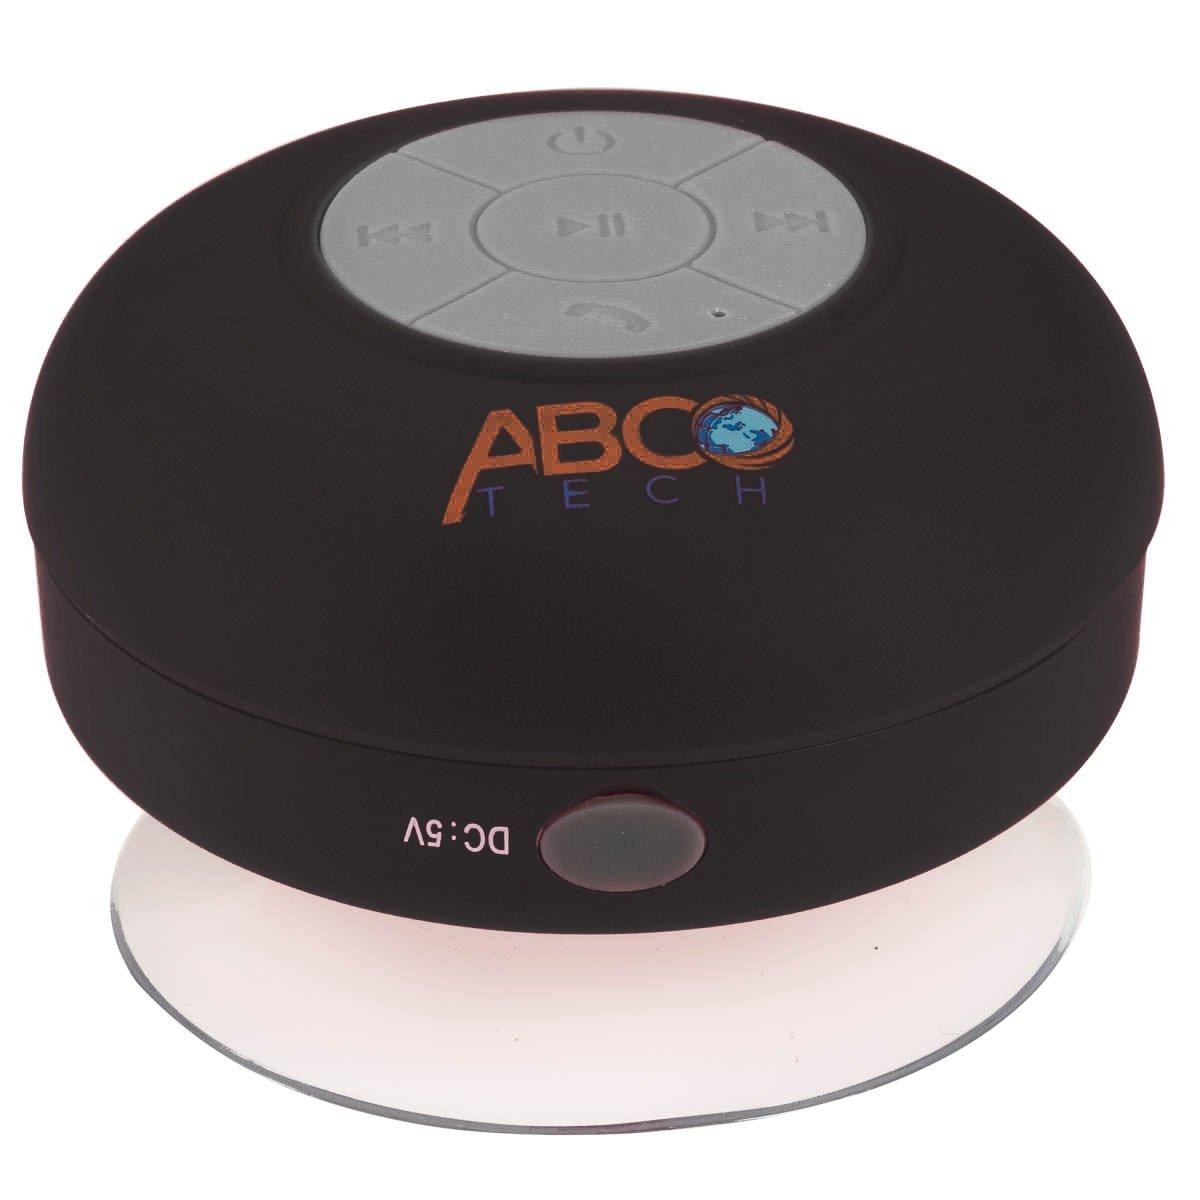 Abco Tech Water Resistant Wireless Bluetooth Speaker